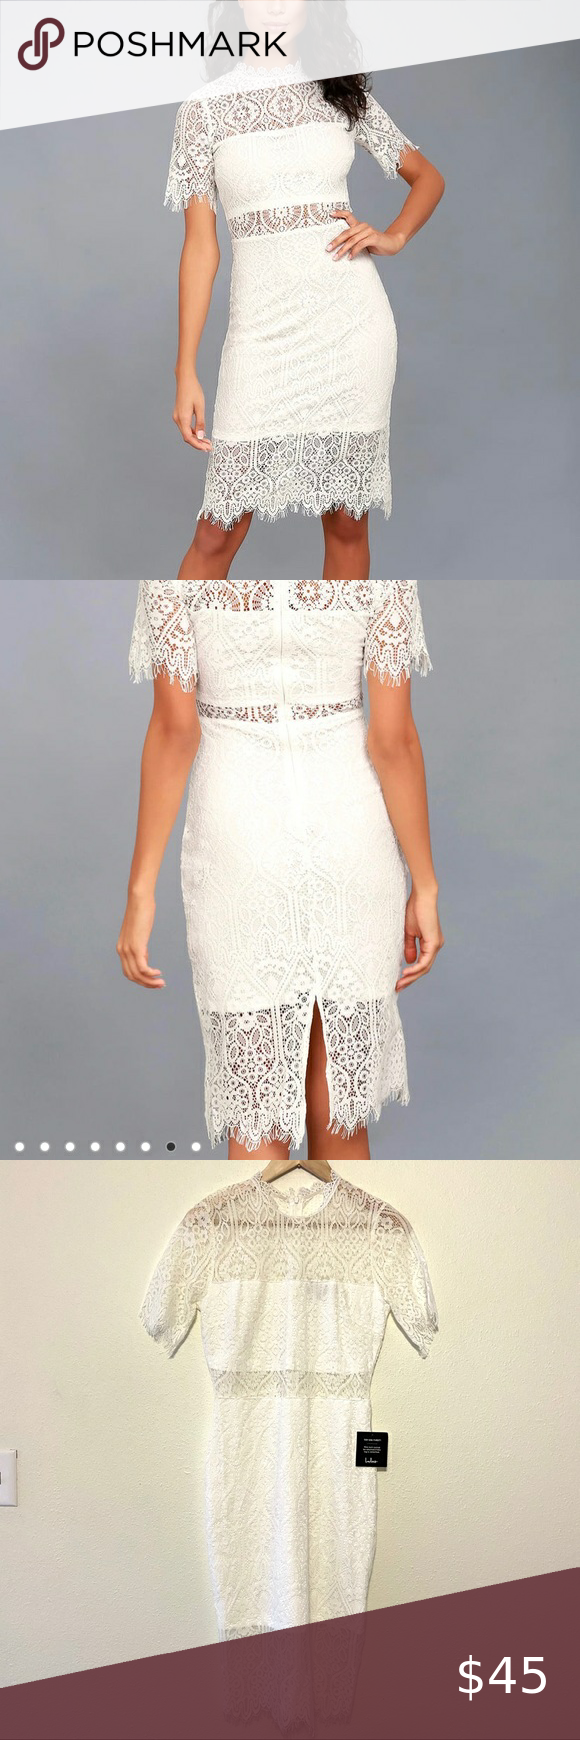 Lulu S Nwt Remarkable White Lace Midi Dress Sheer White Lace Midi Dress Lace Midi Dress Sheer Dress [ 1740 x 580 Pixel ]